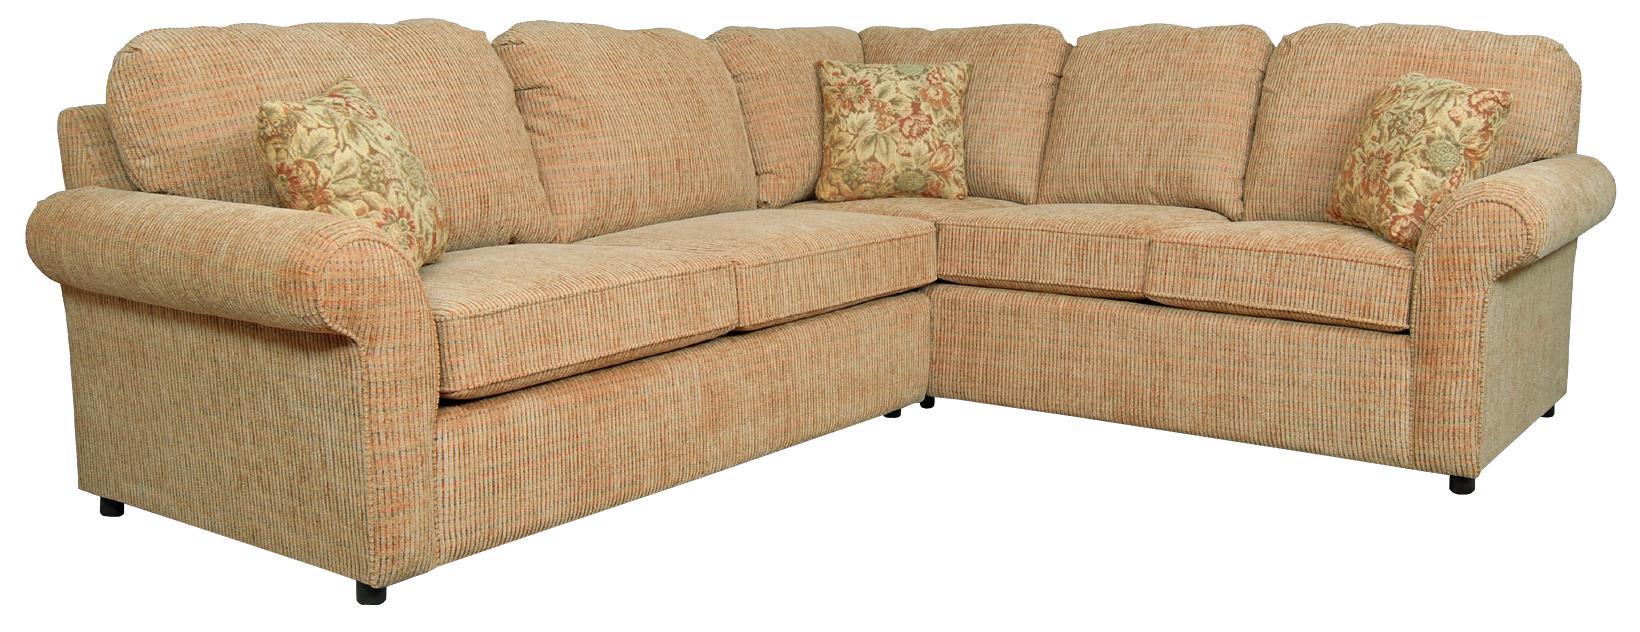 4-5 Seat Corner Sofa with <b>Sleeper</b>